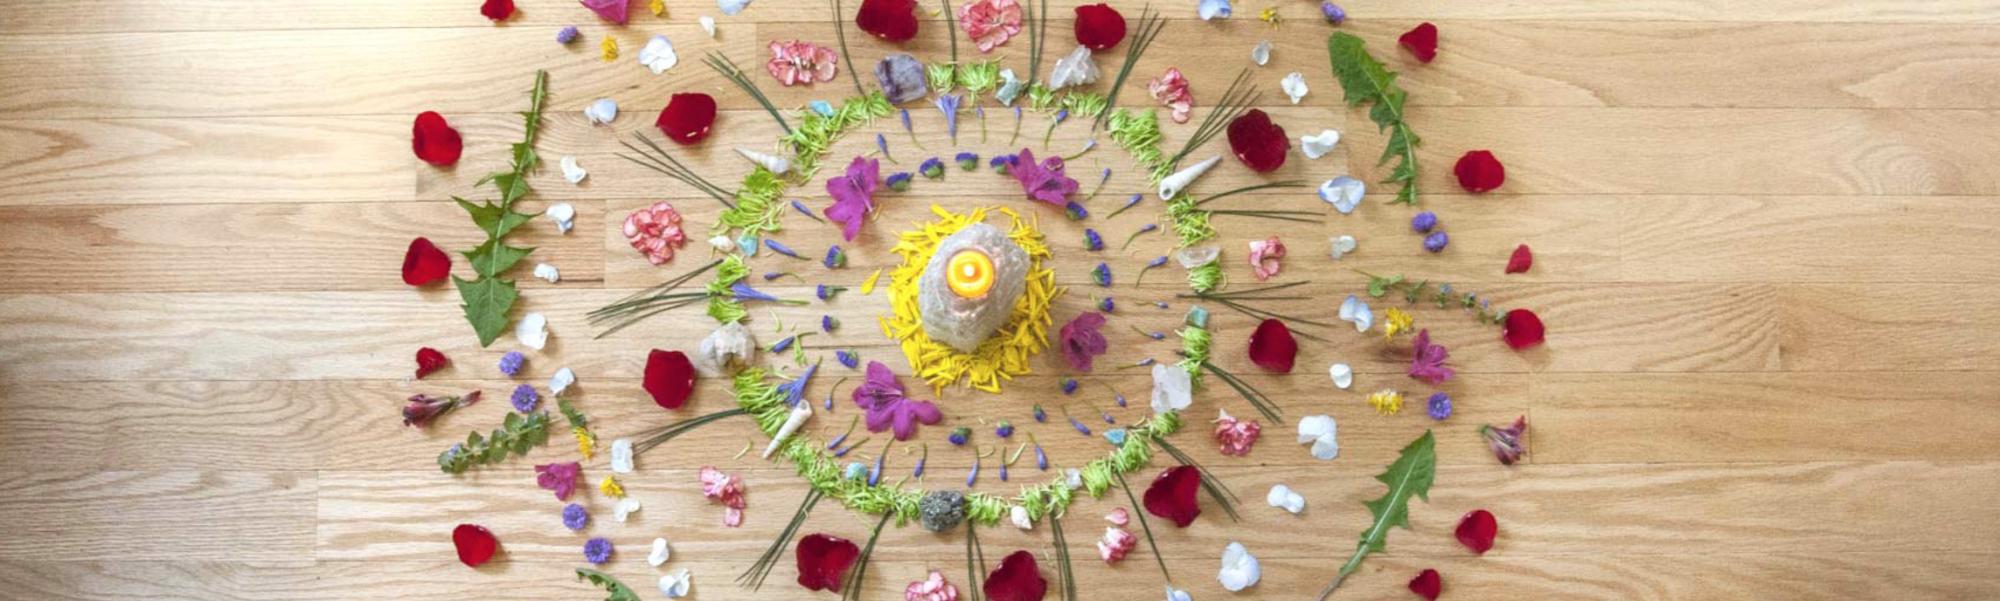 Summer Solstice Celebration Ideas